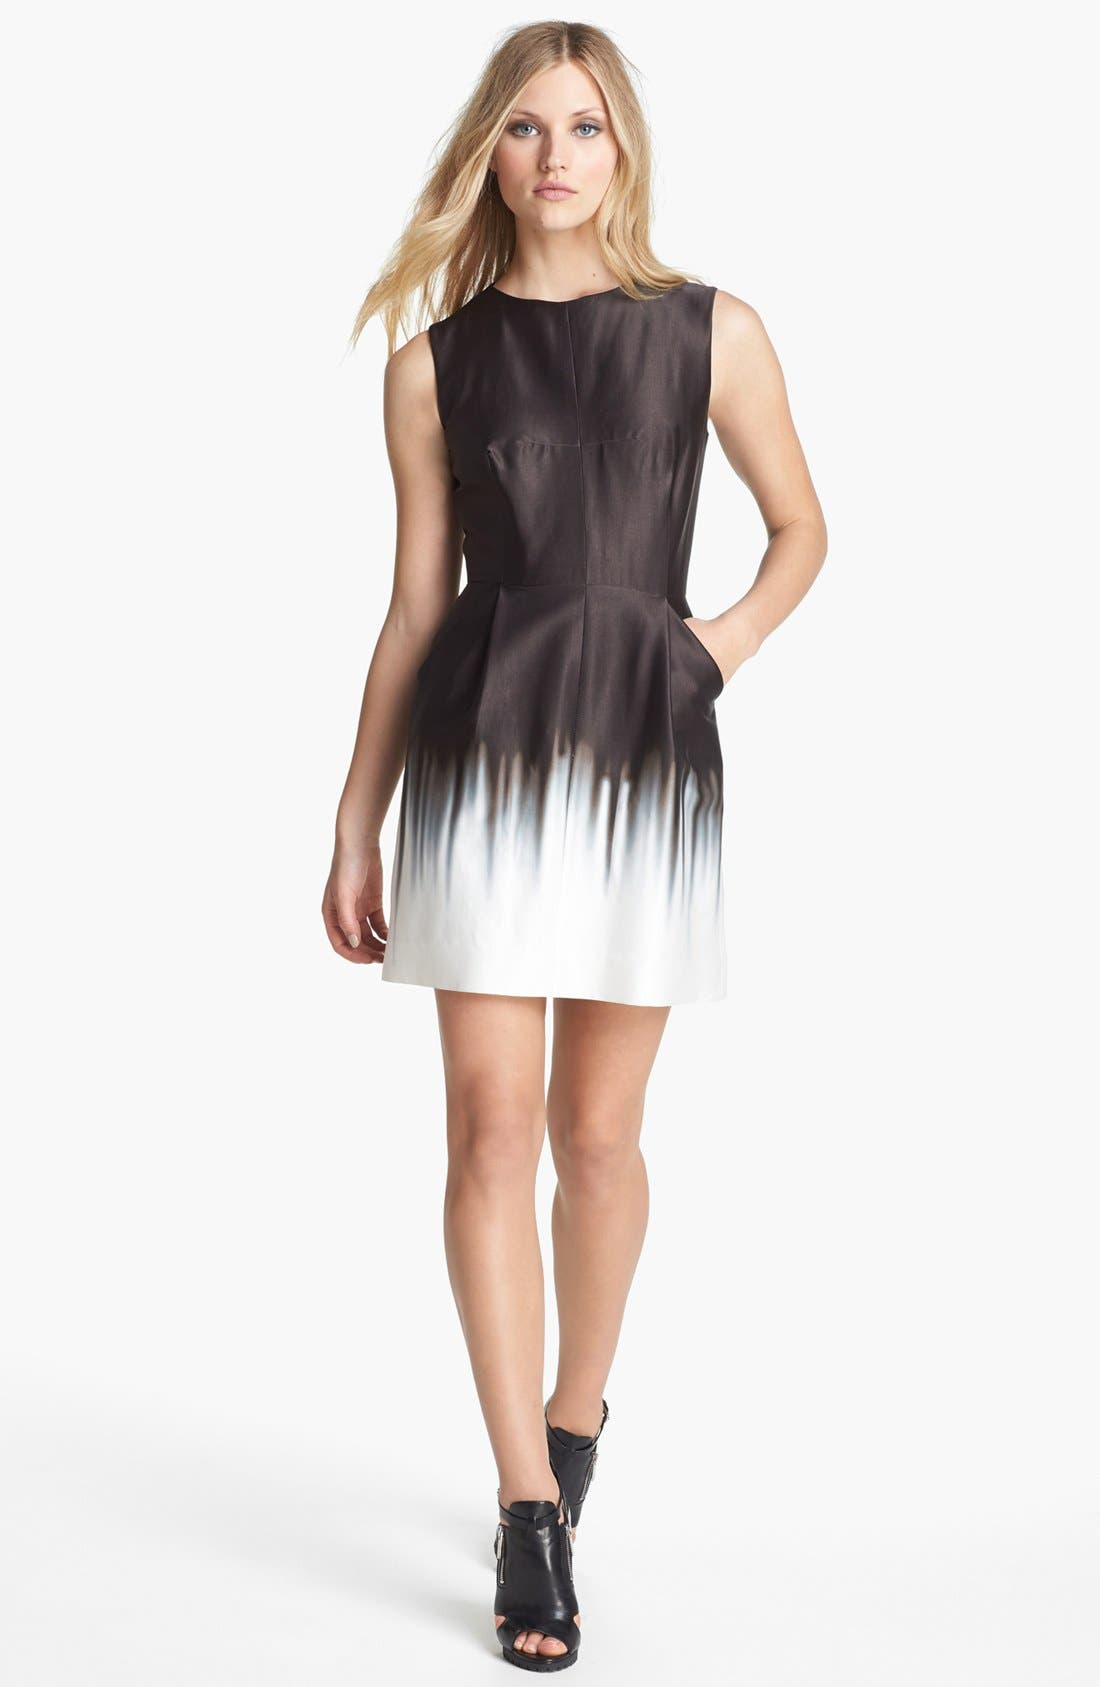 MILLY 'Coco' Print Sheath Dress, Main, color, 150